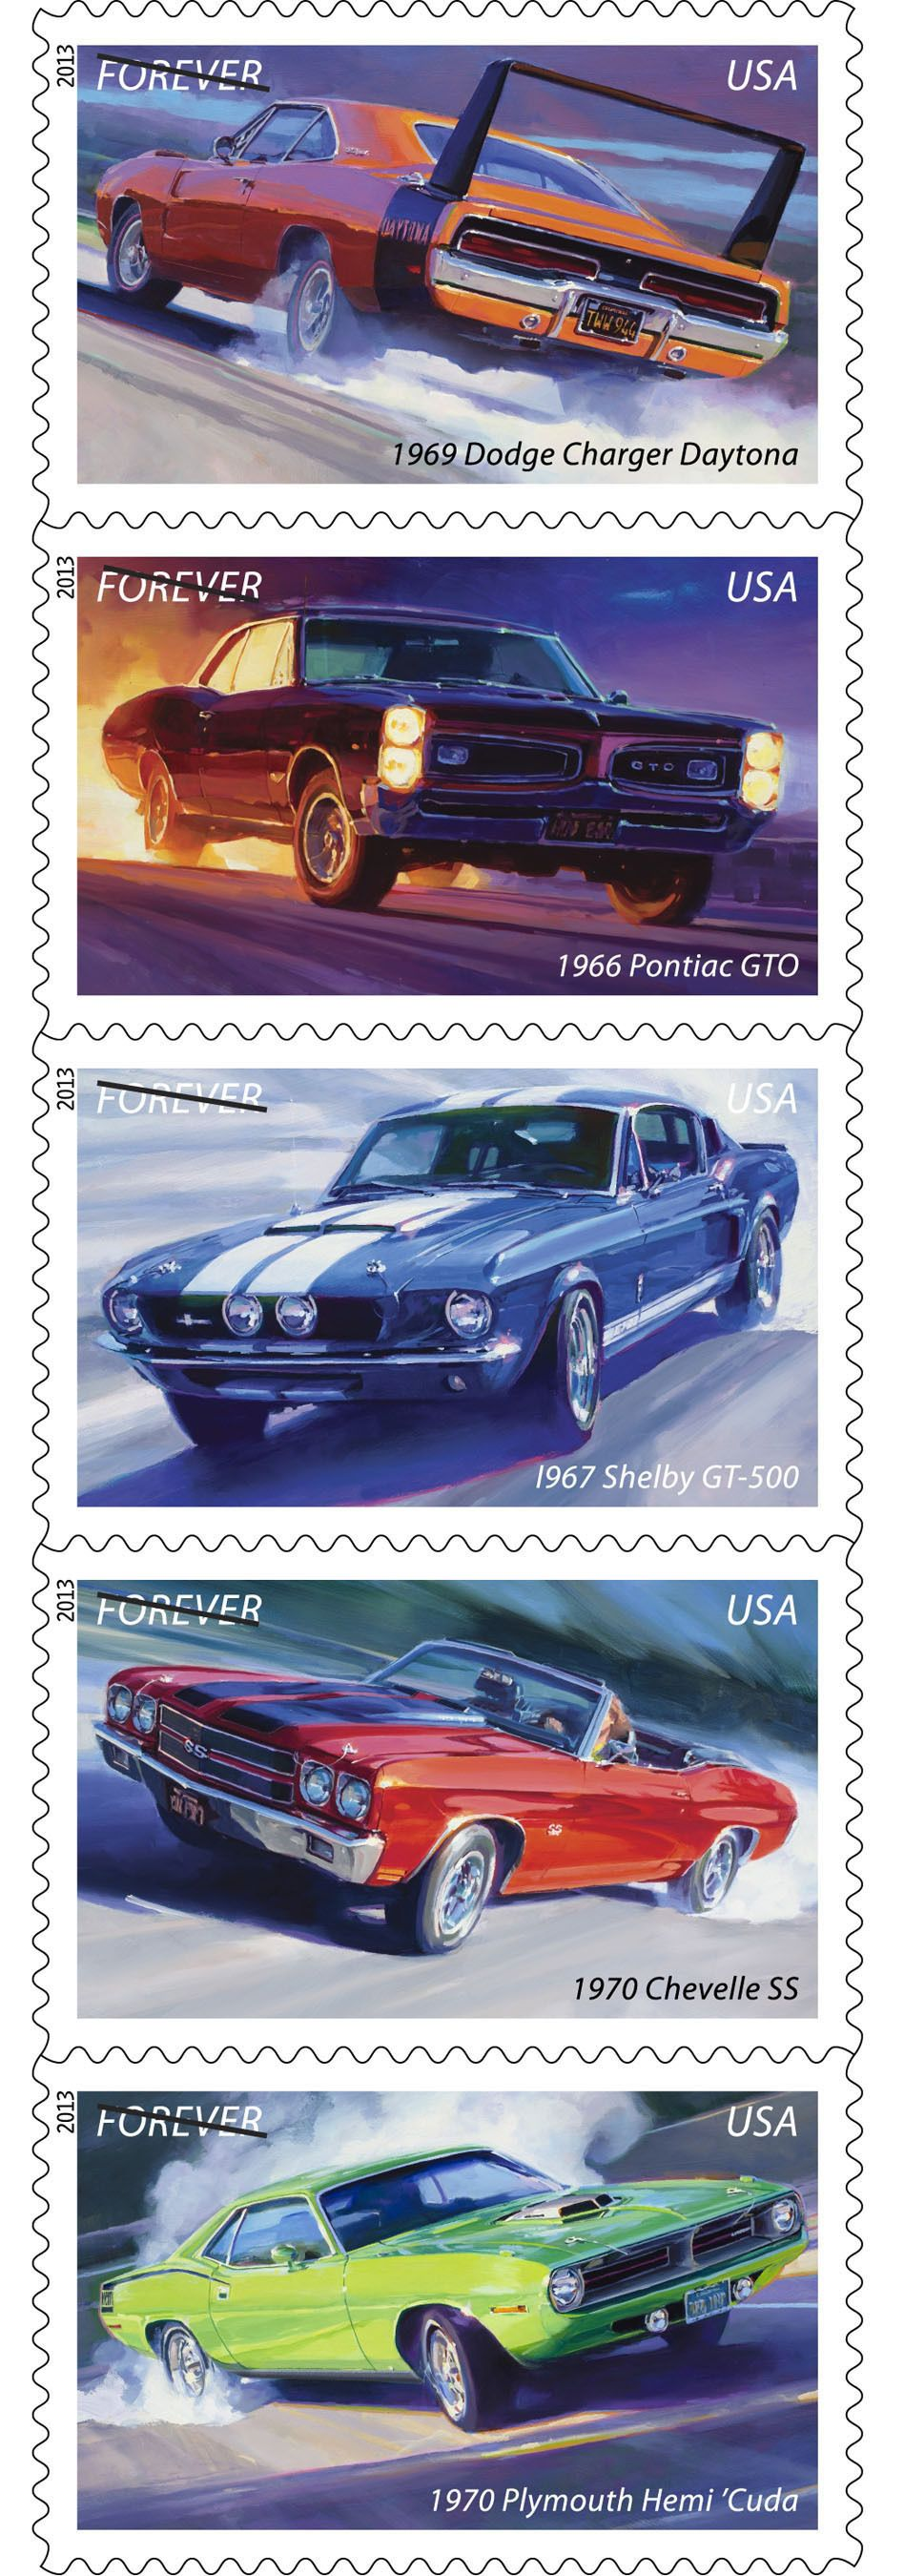 U S Postal Service Muscle Cars